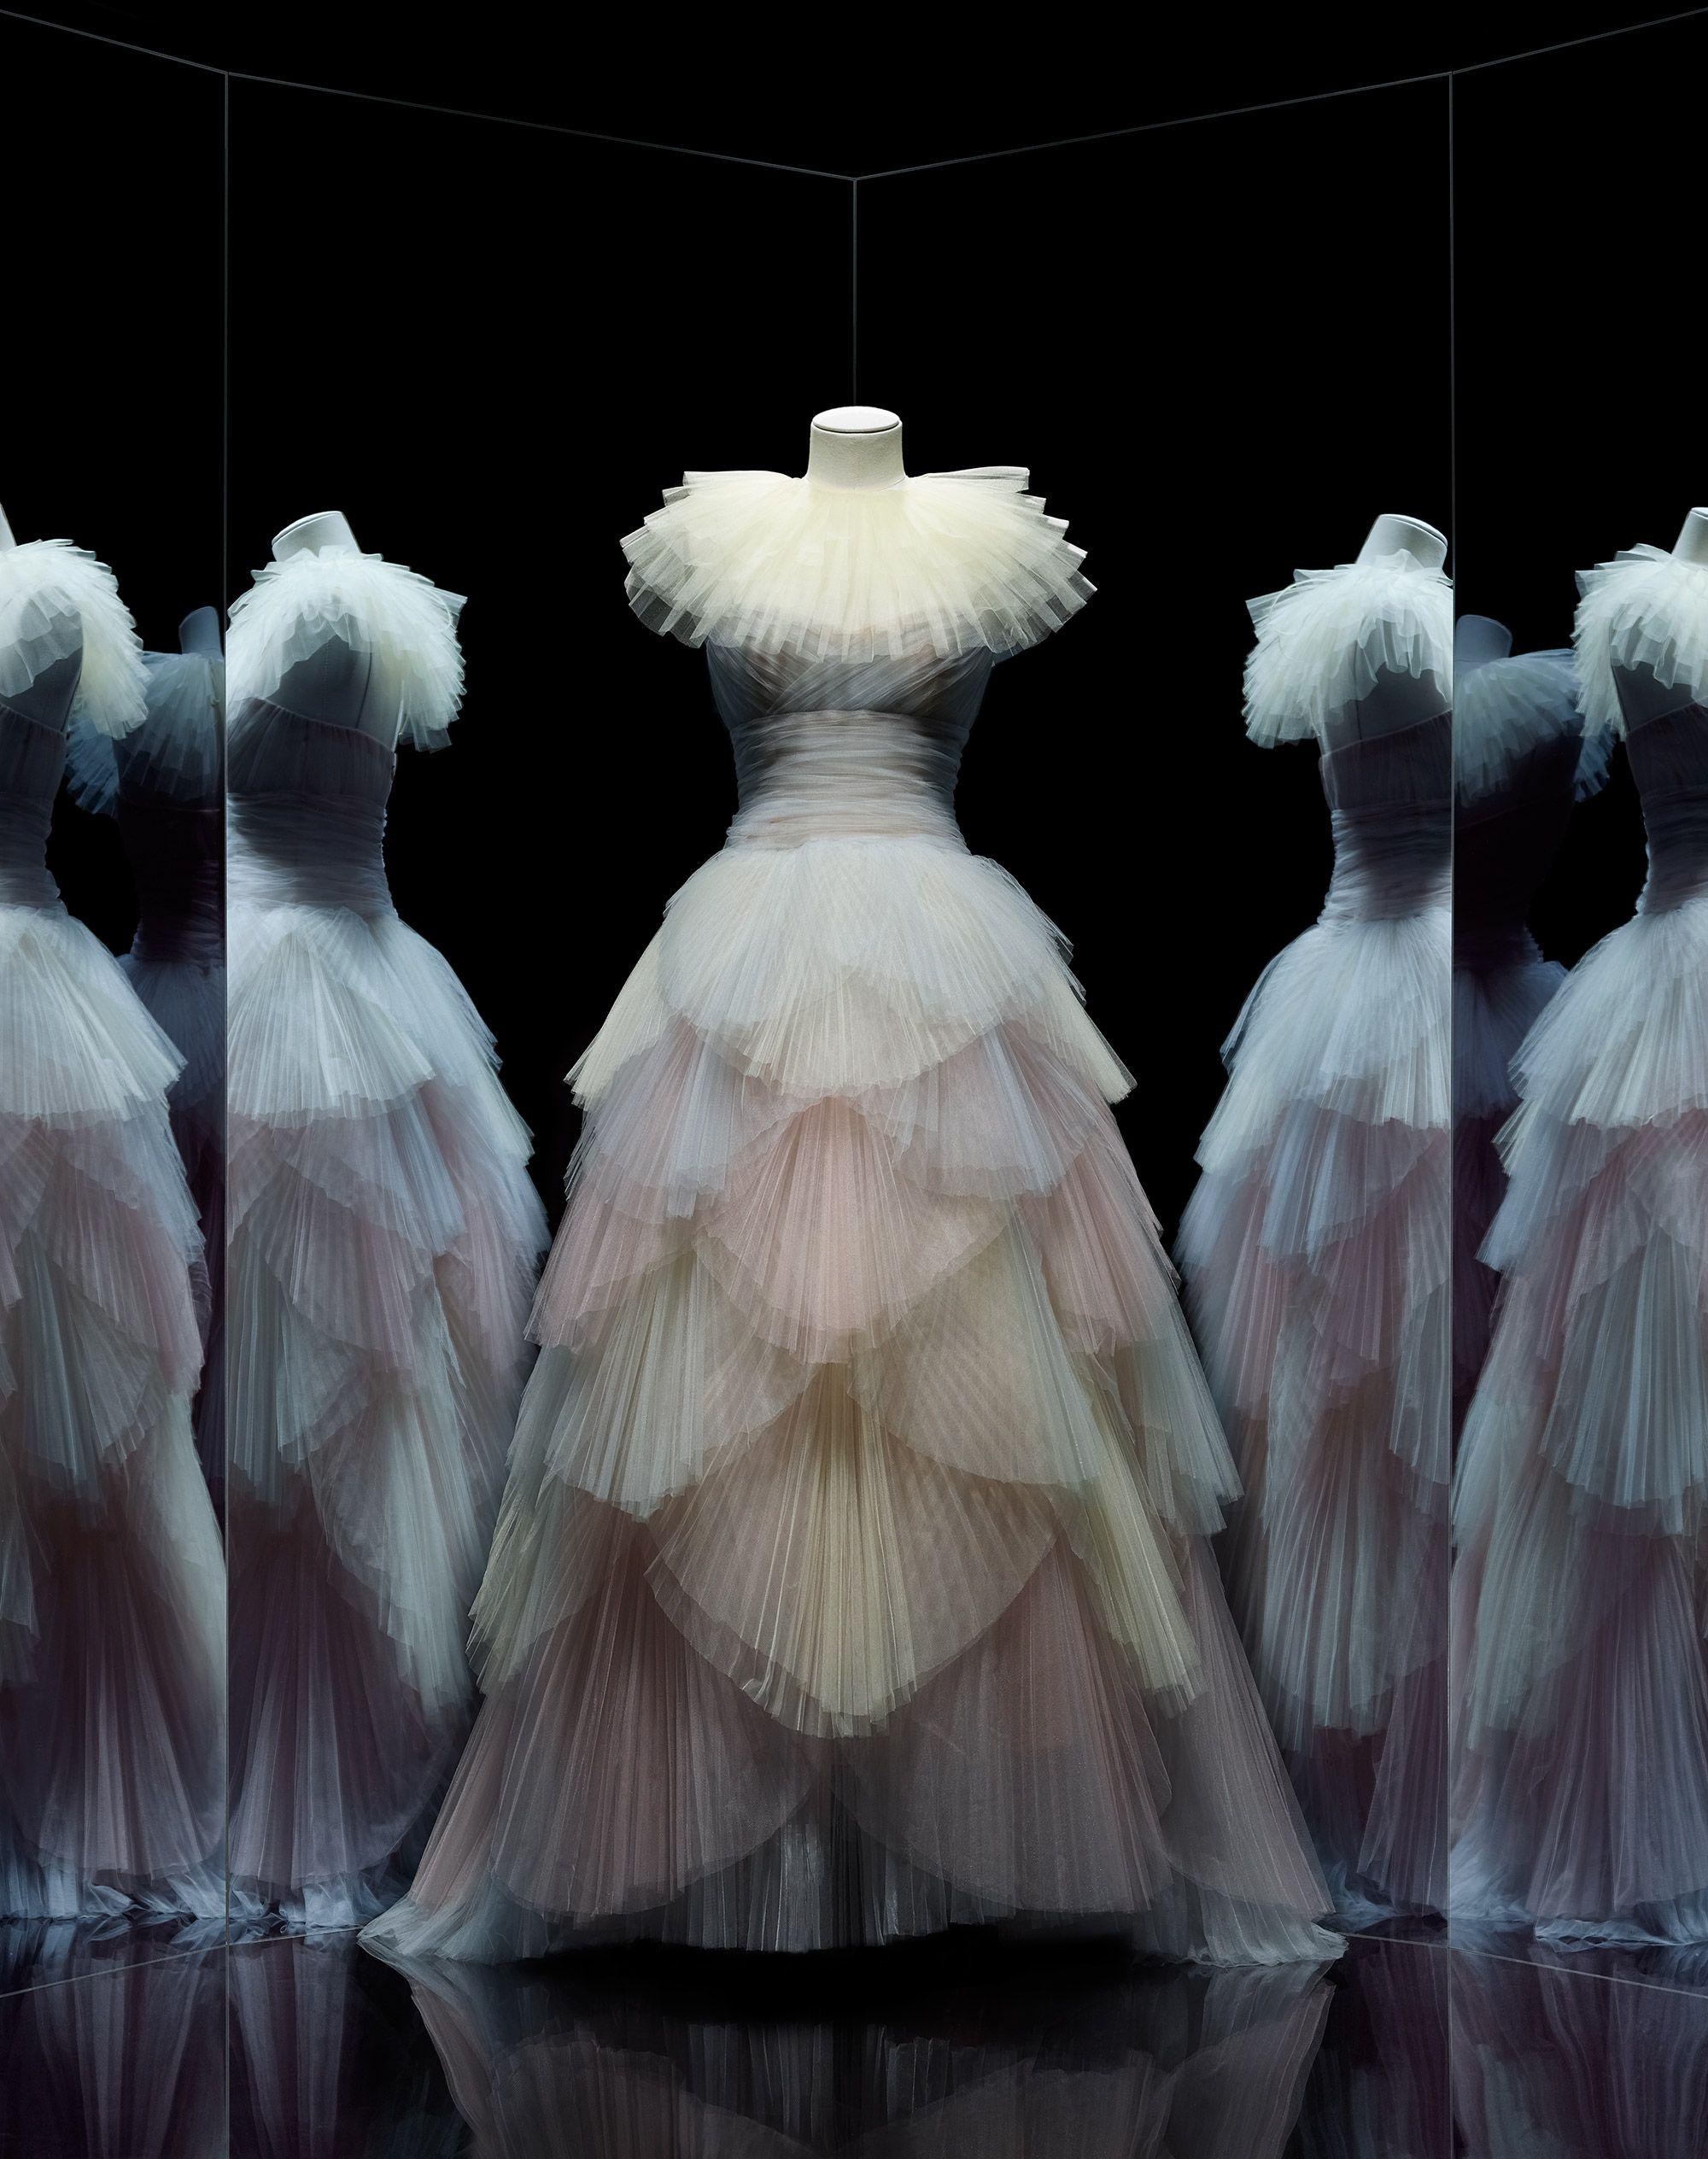 d65a3a0051 Christian Dior, couturier du rêve | Vintage Fashion | Robe chic ...